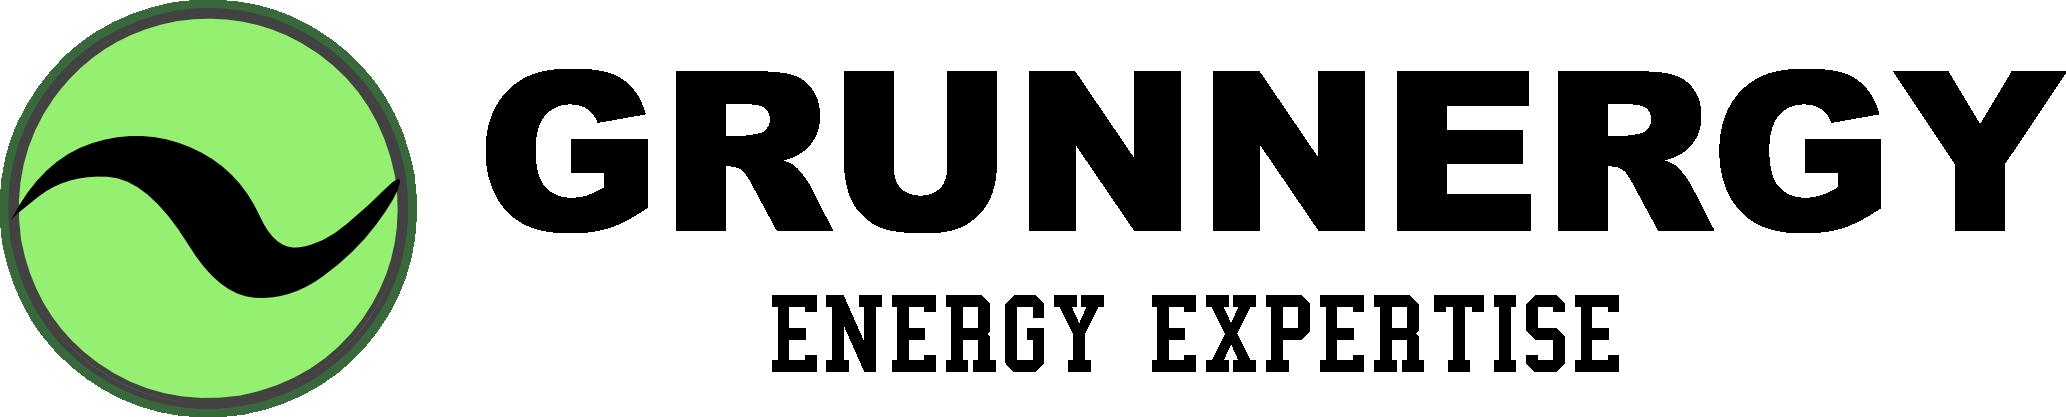 grunnergy